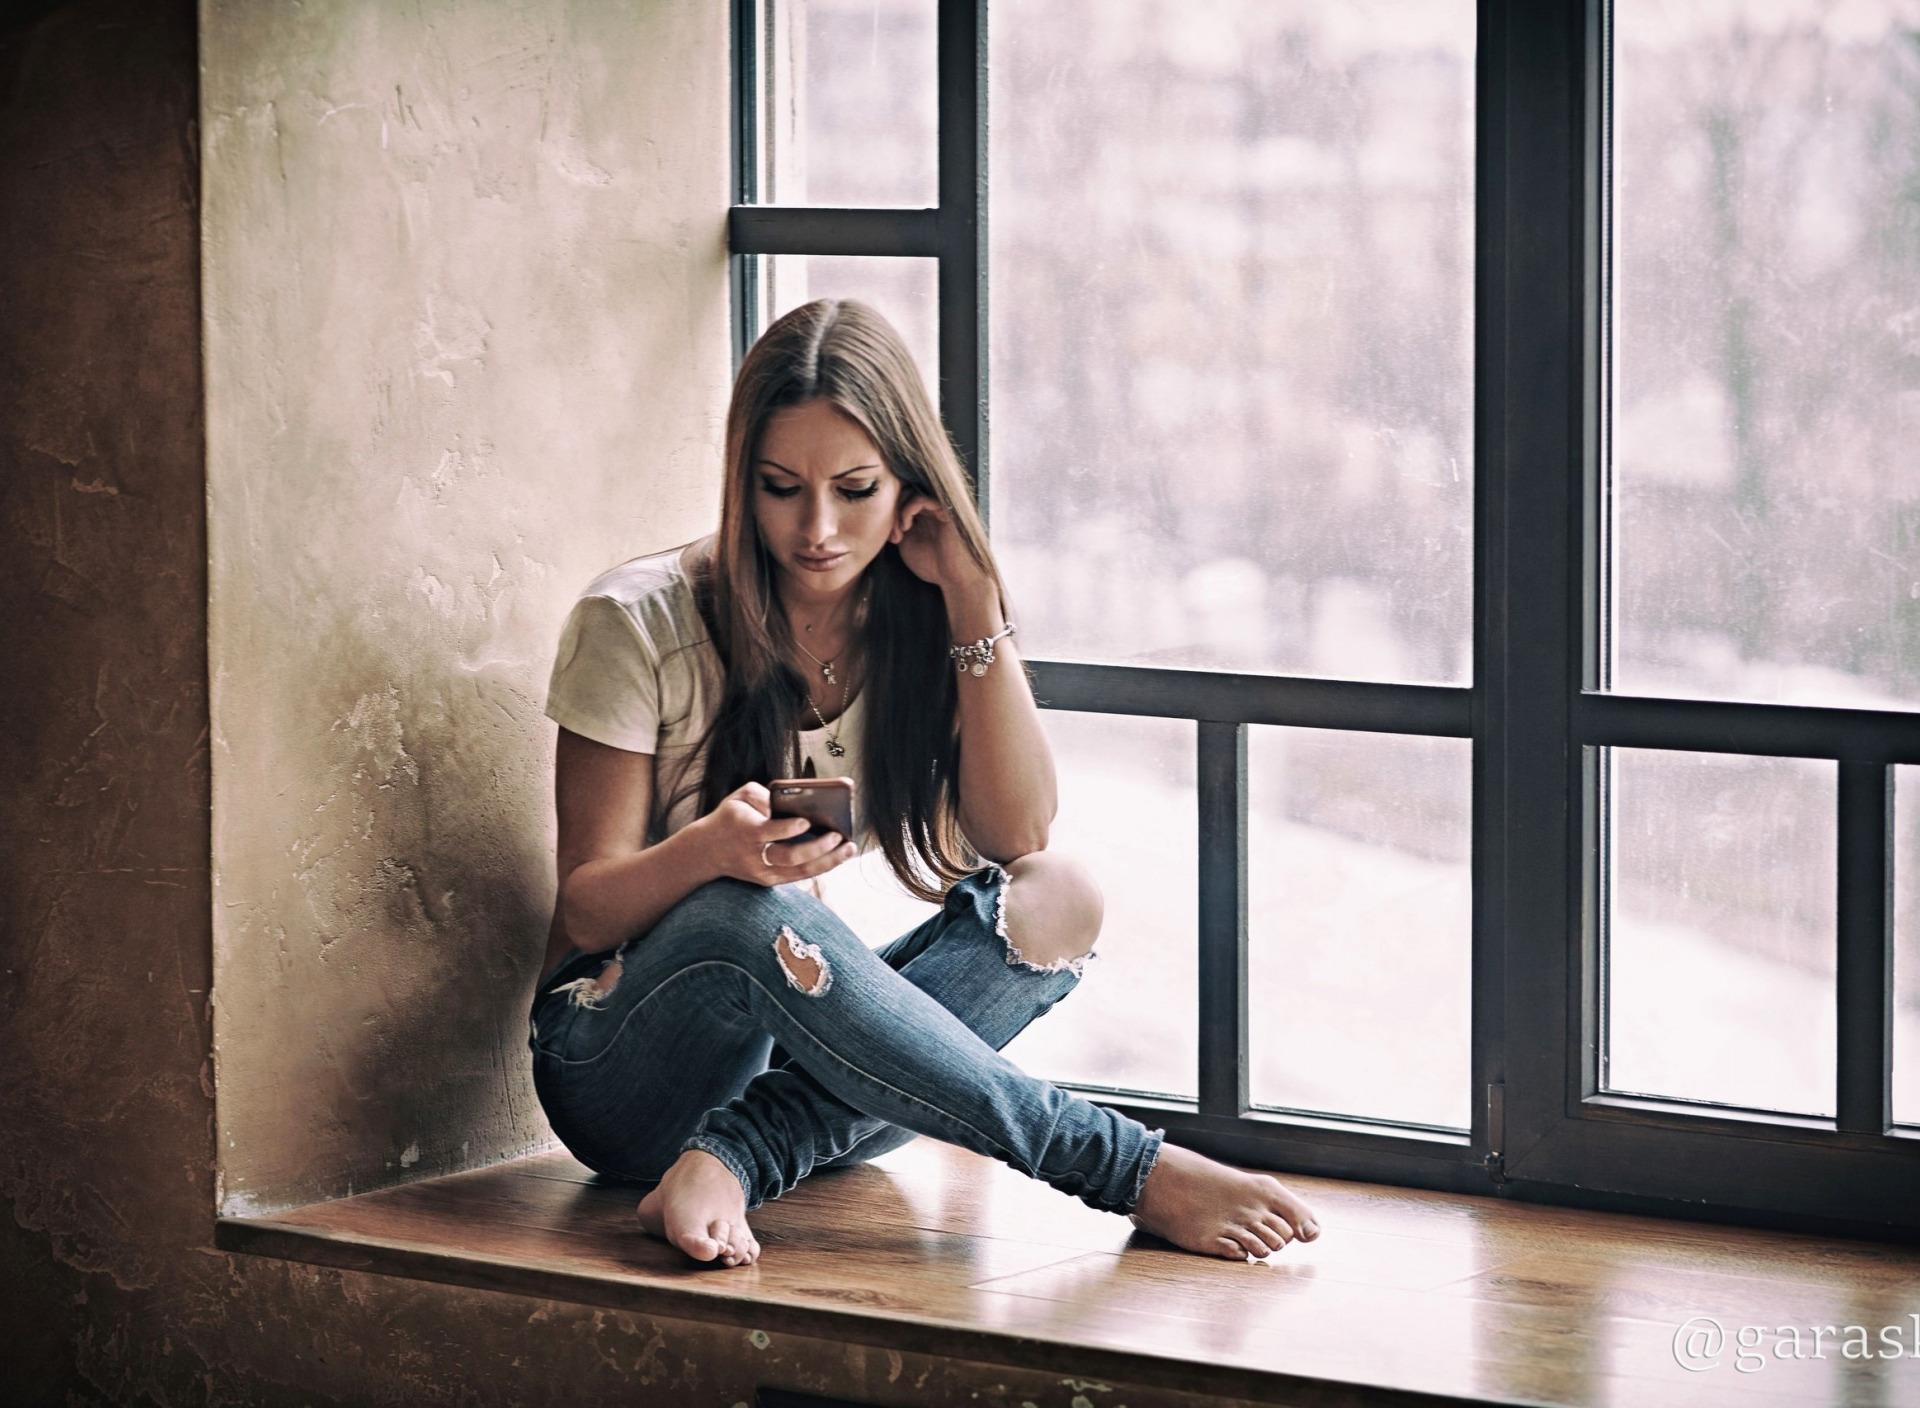 Картинки девушек сидящих на подоконнике